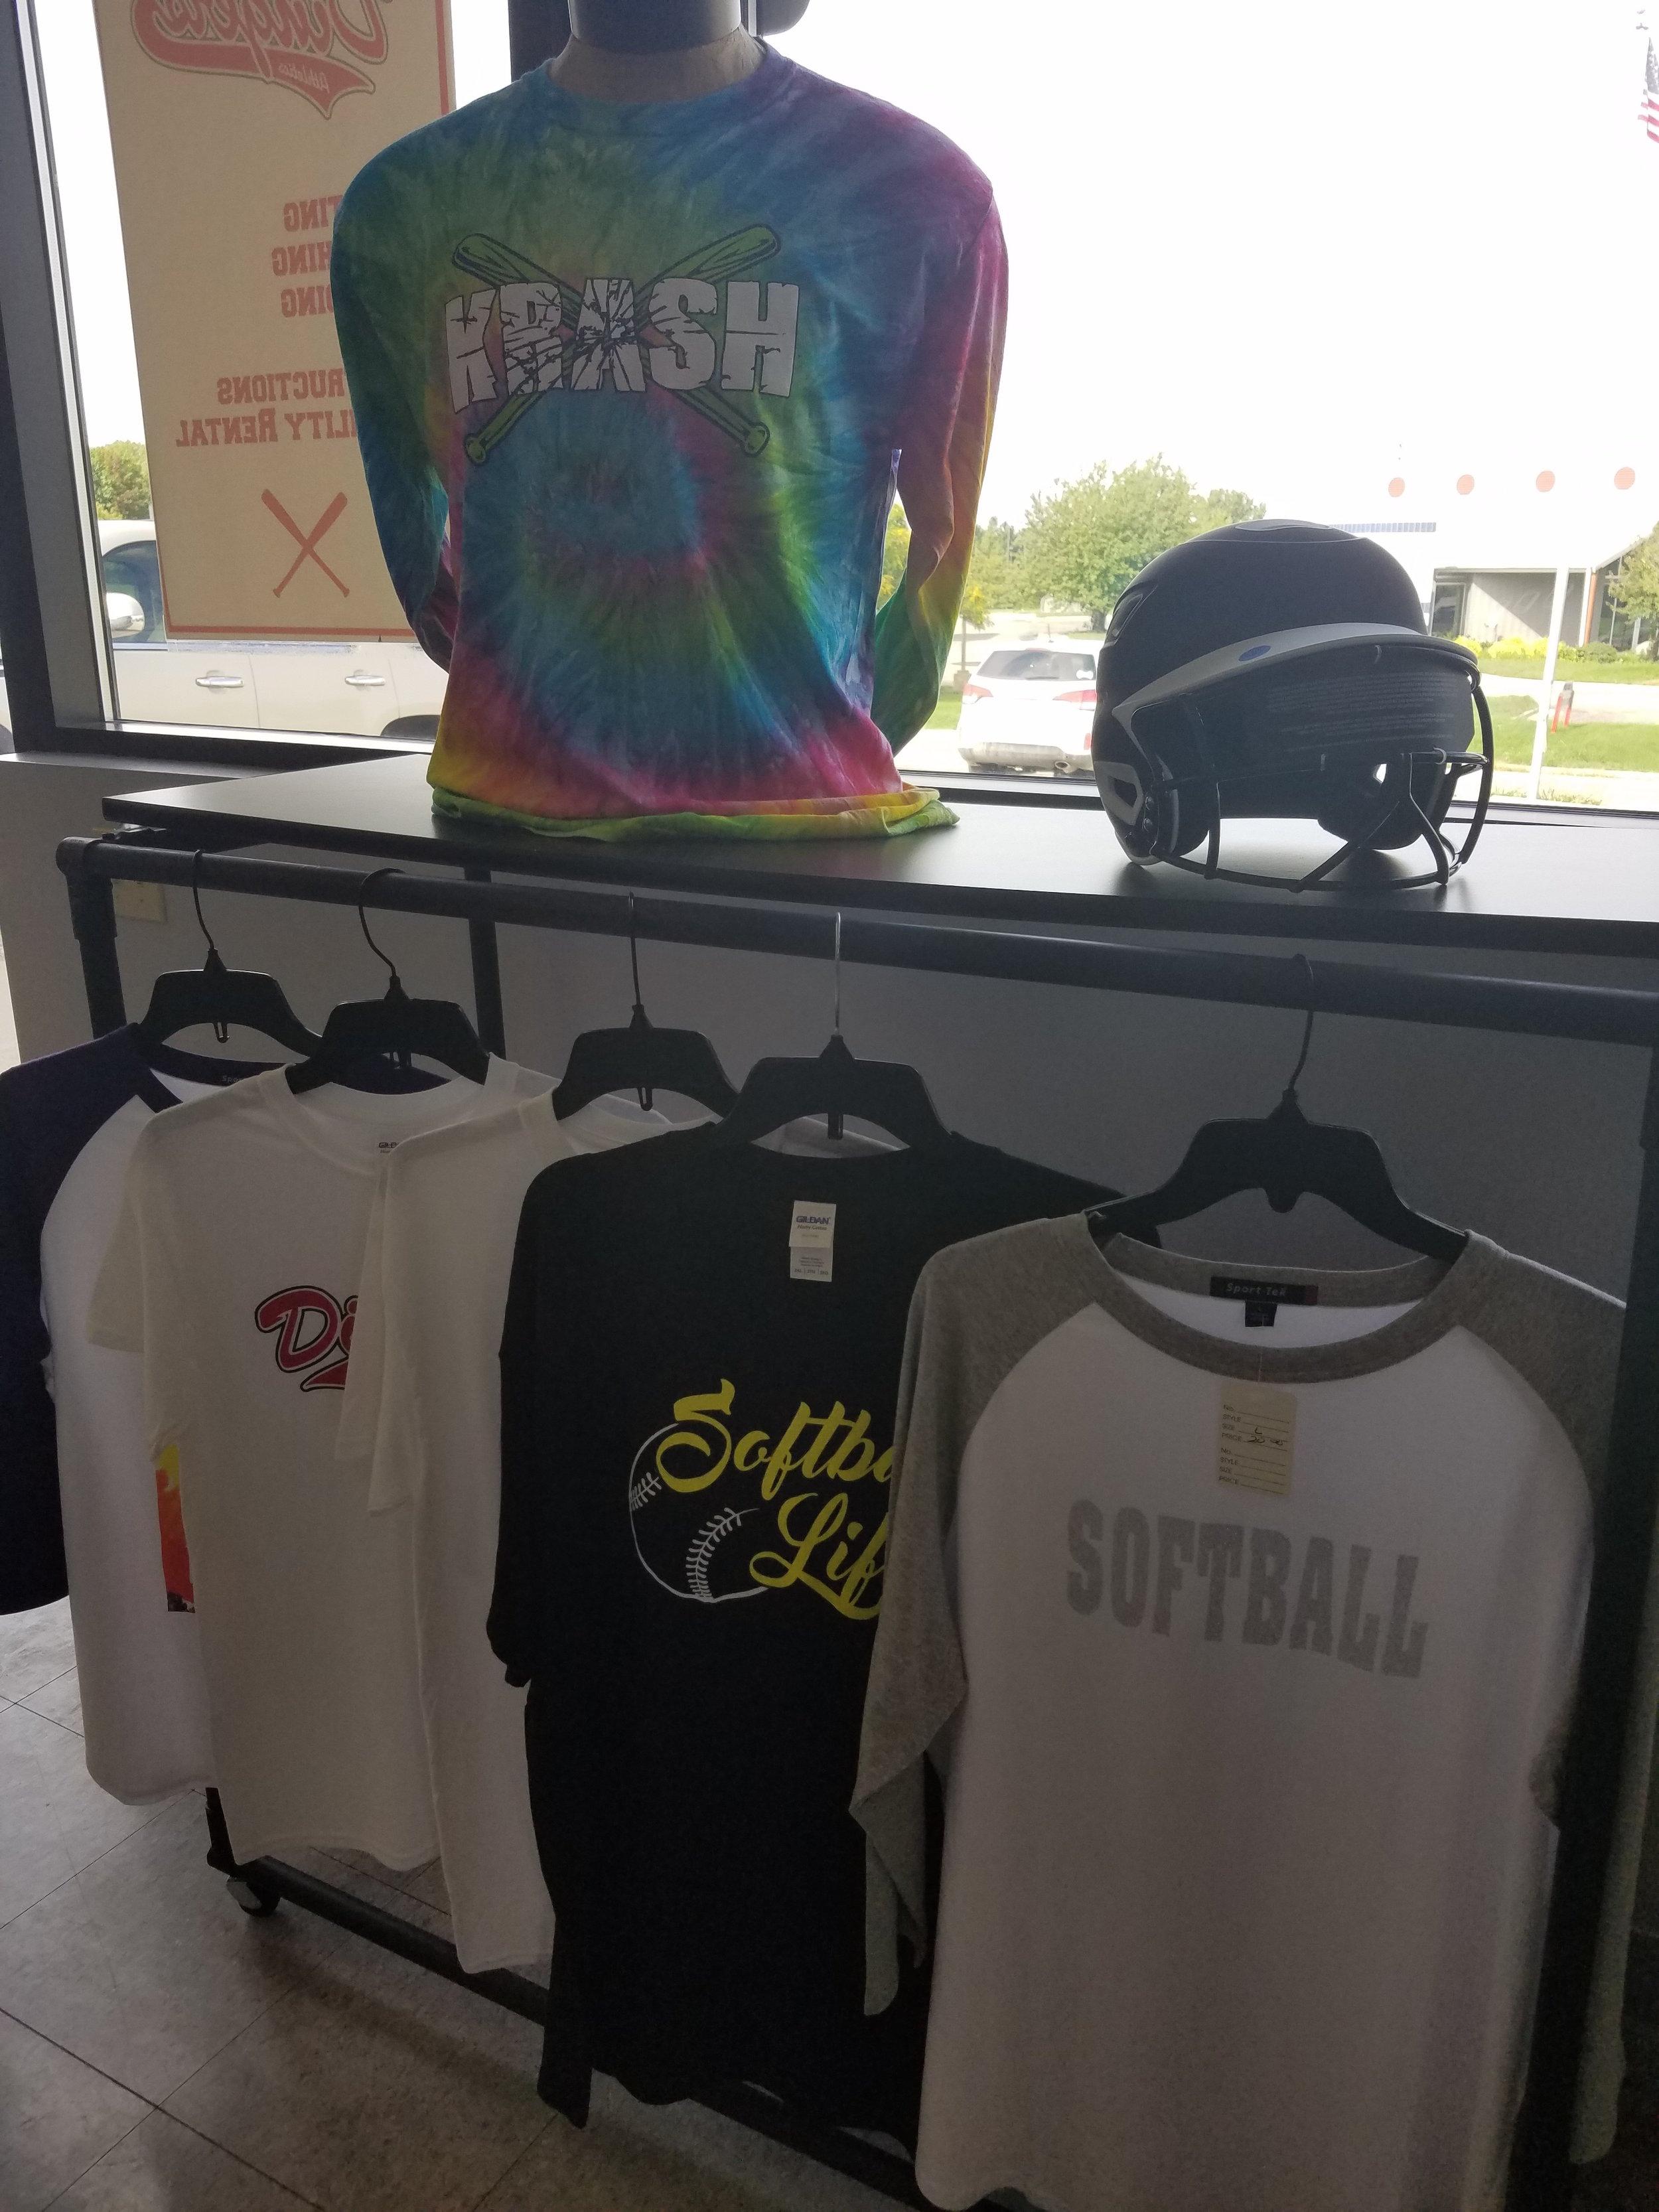 SP - Shirts.jpg